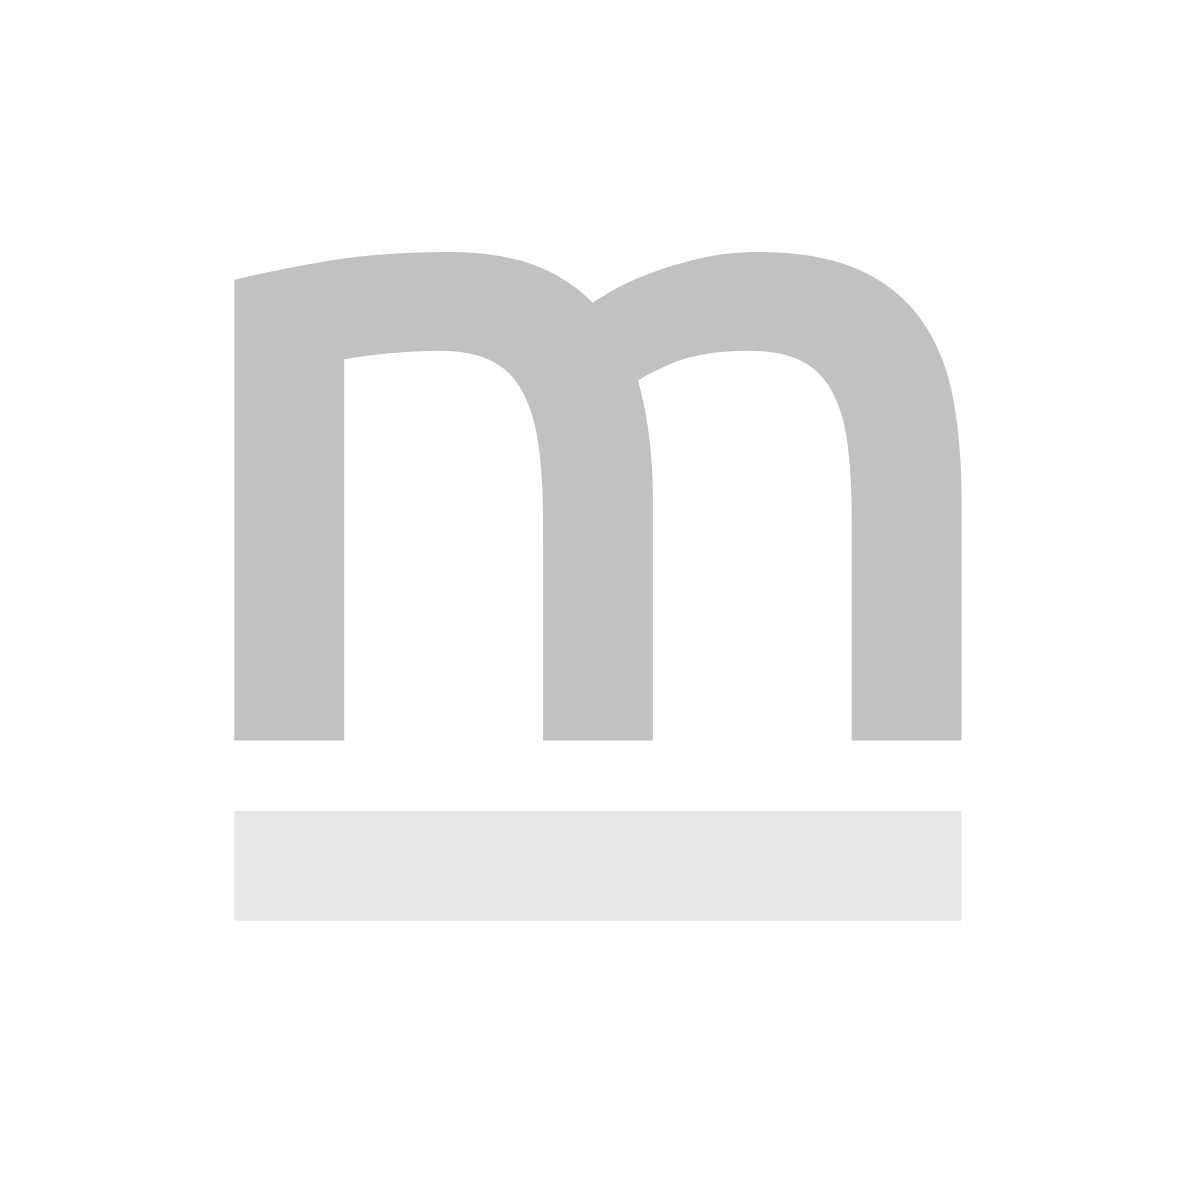 Krzesło NAPO BL VELVET szare